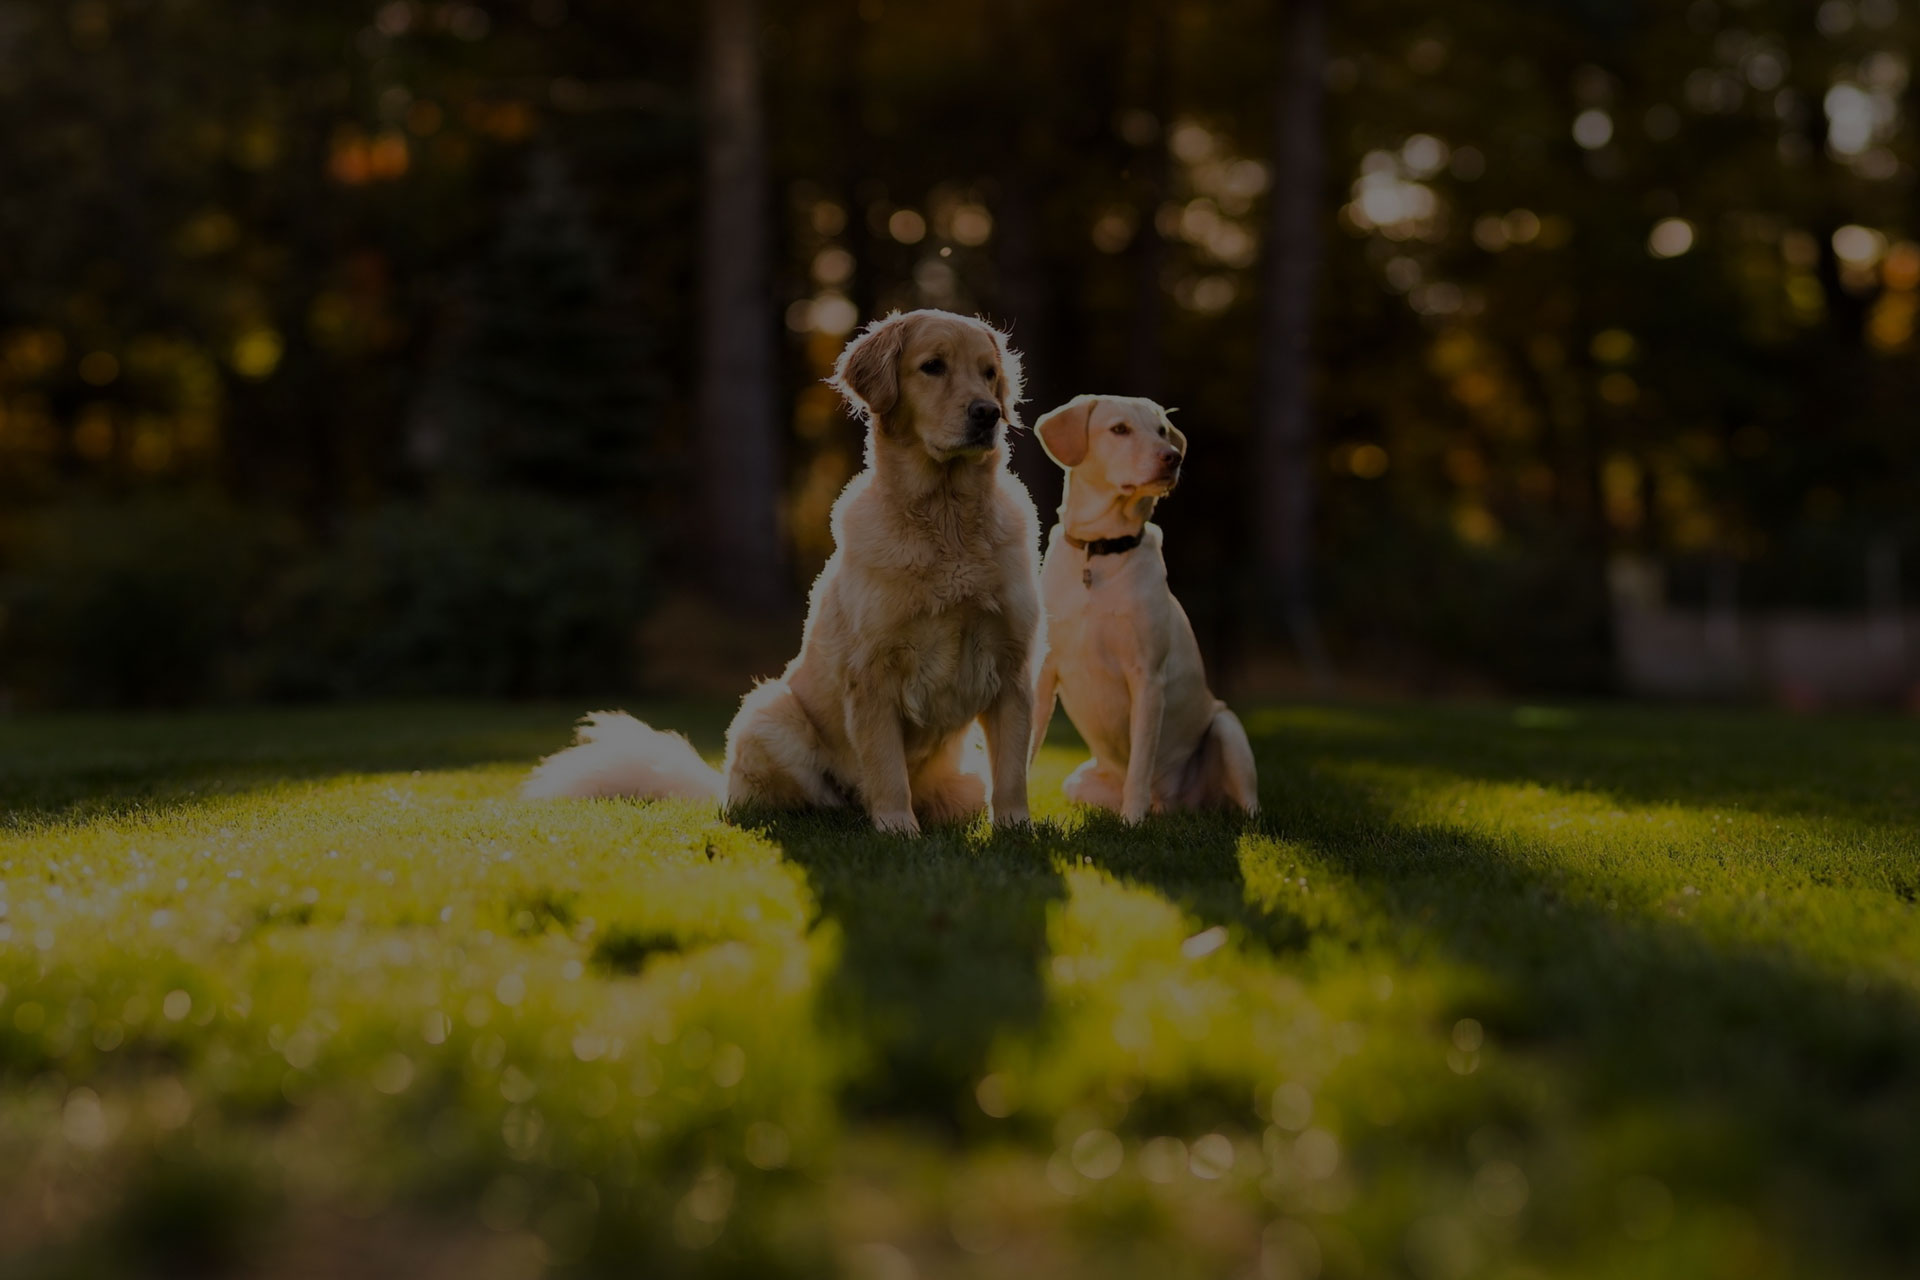 protrait dog photo with beautiful nature